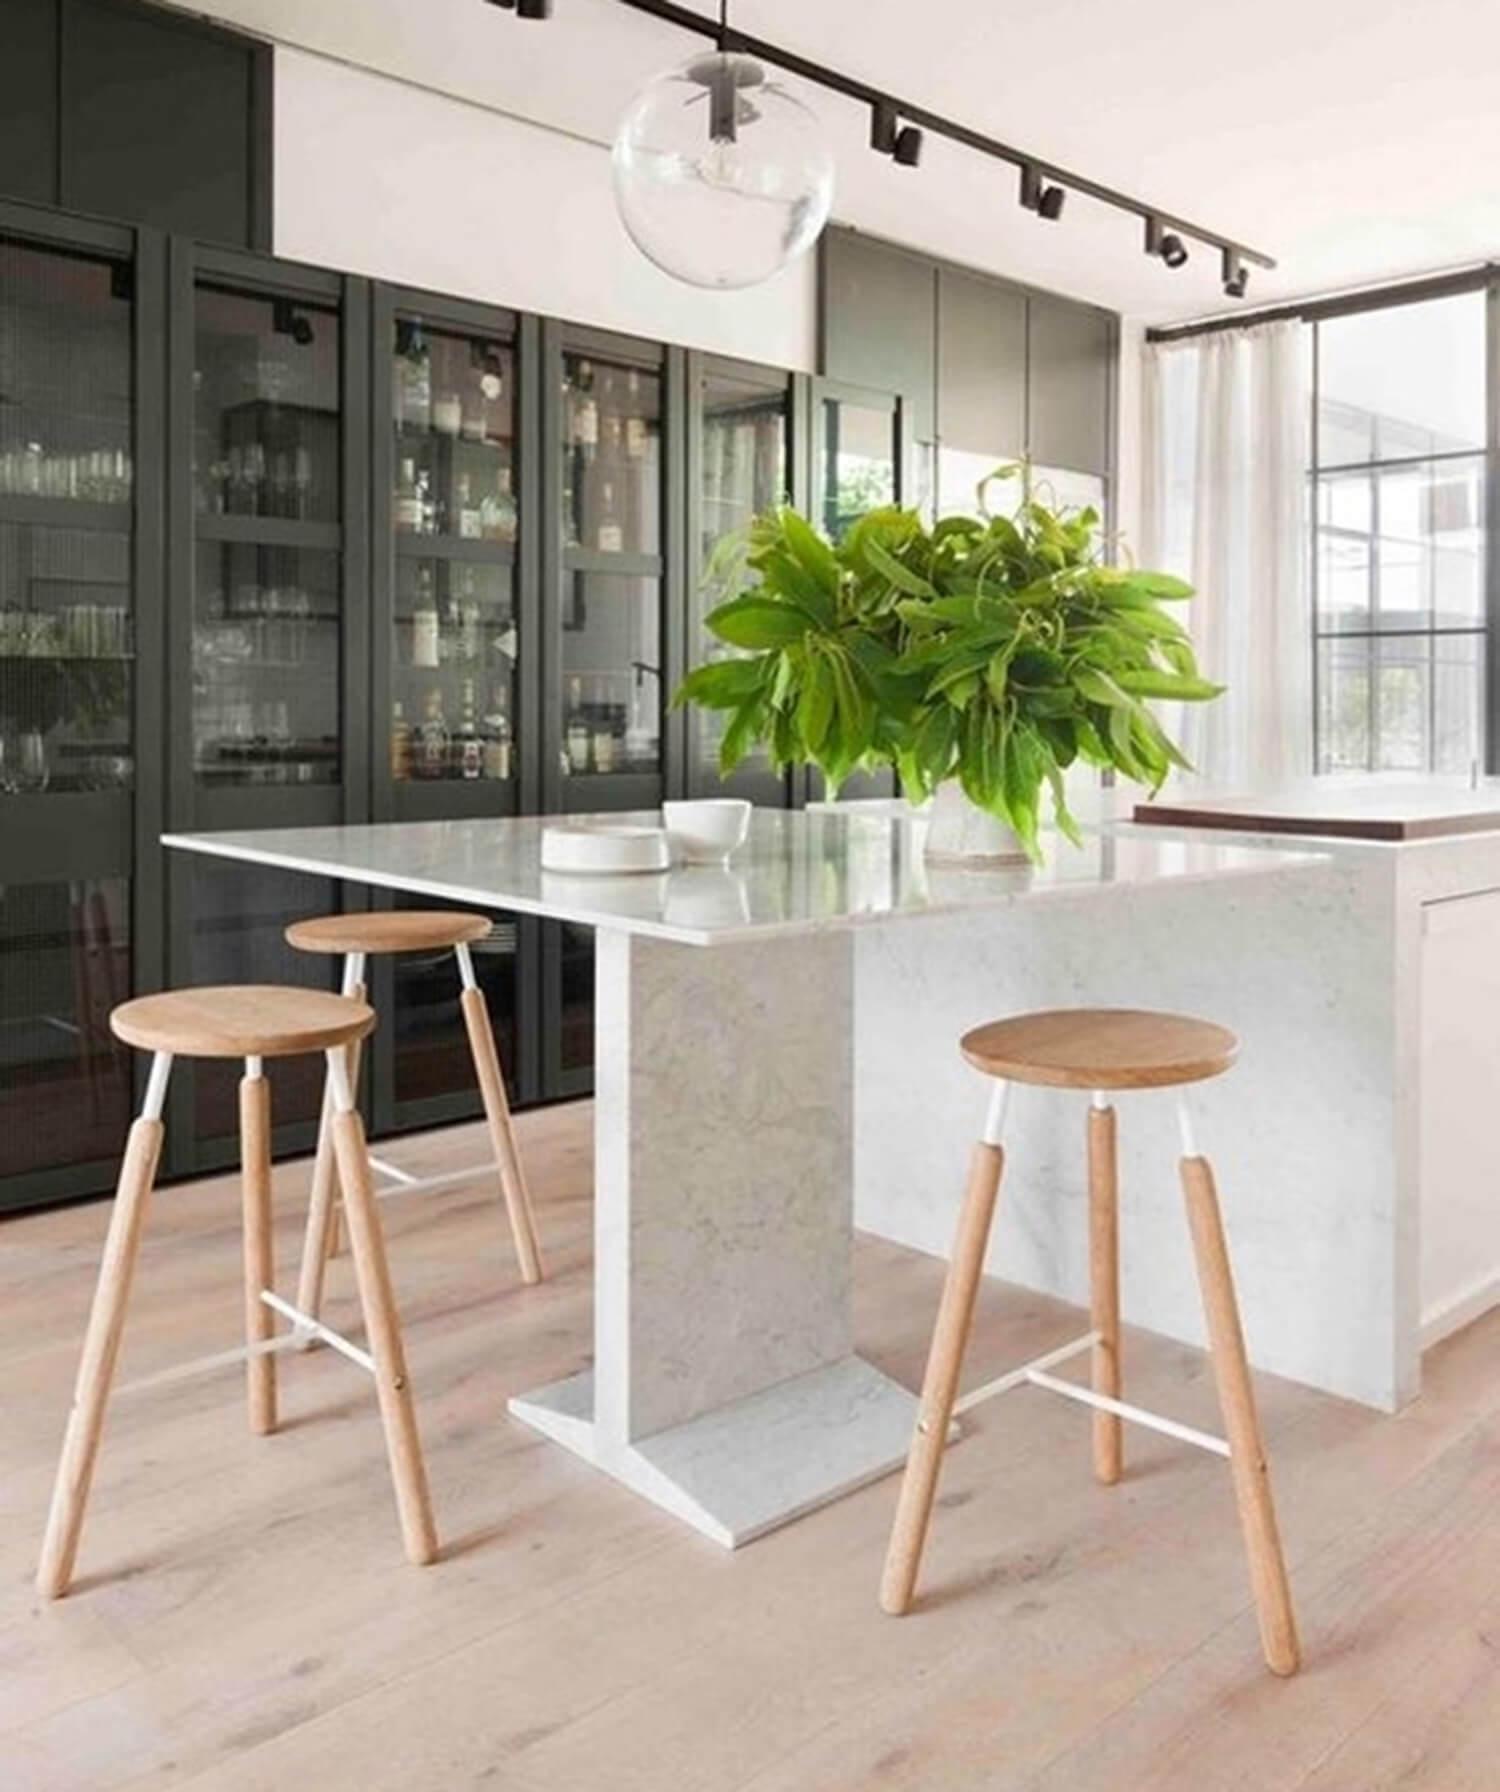 est living kitchen covet raft stool hecker guthrie design directory 1